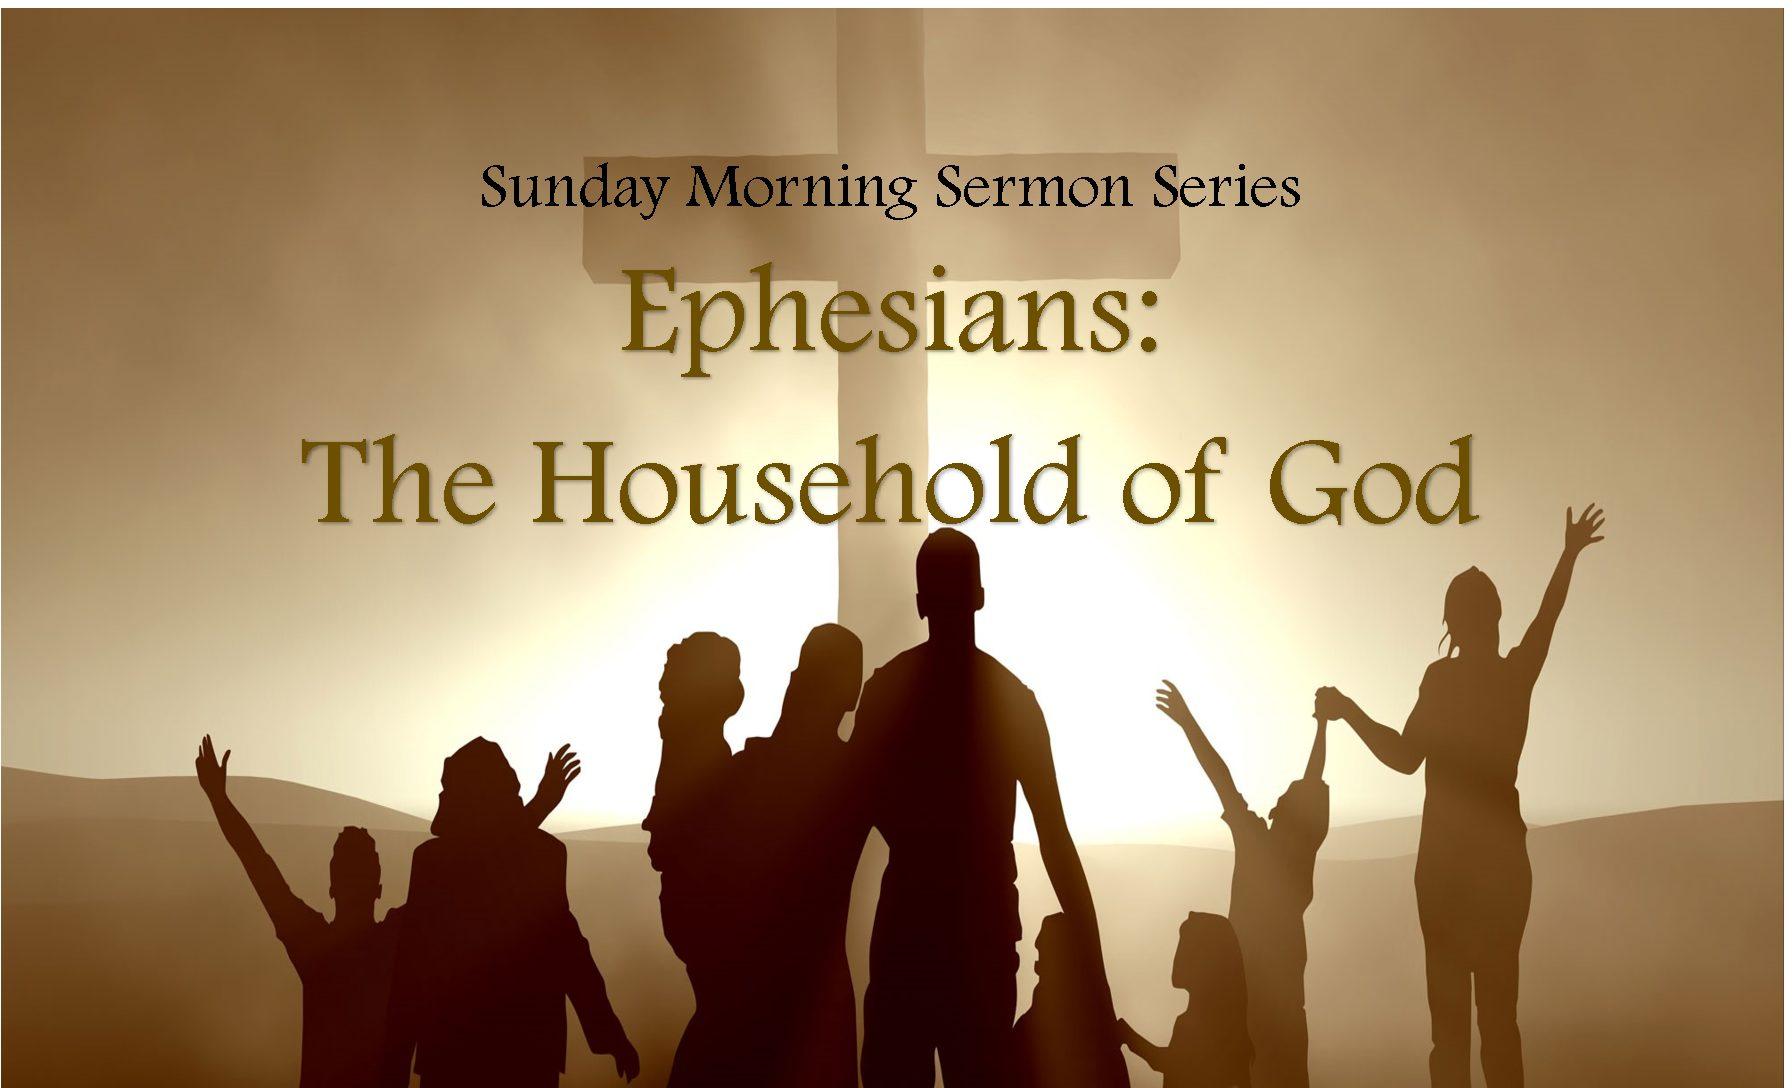 The Household of God: Walk Worthy of God's Calling